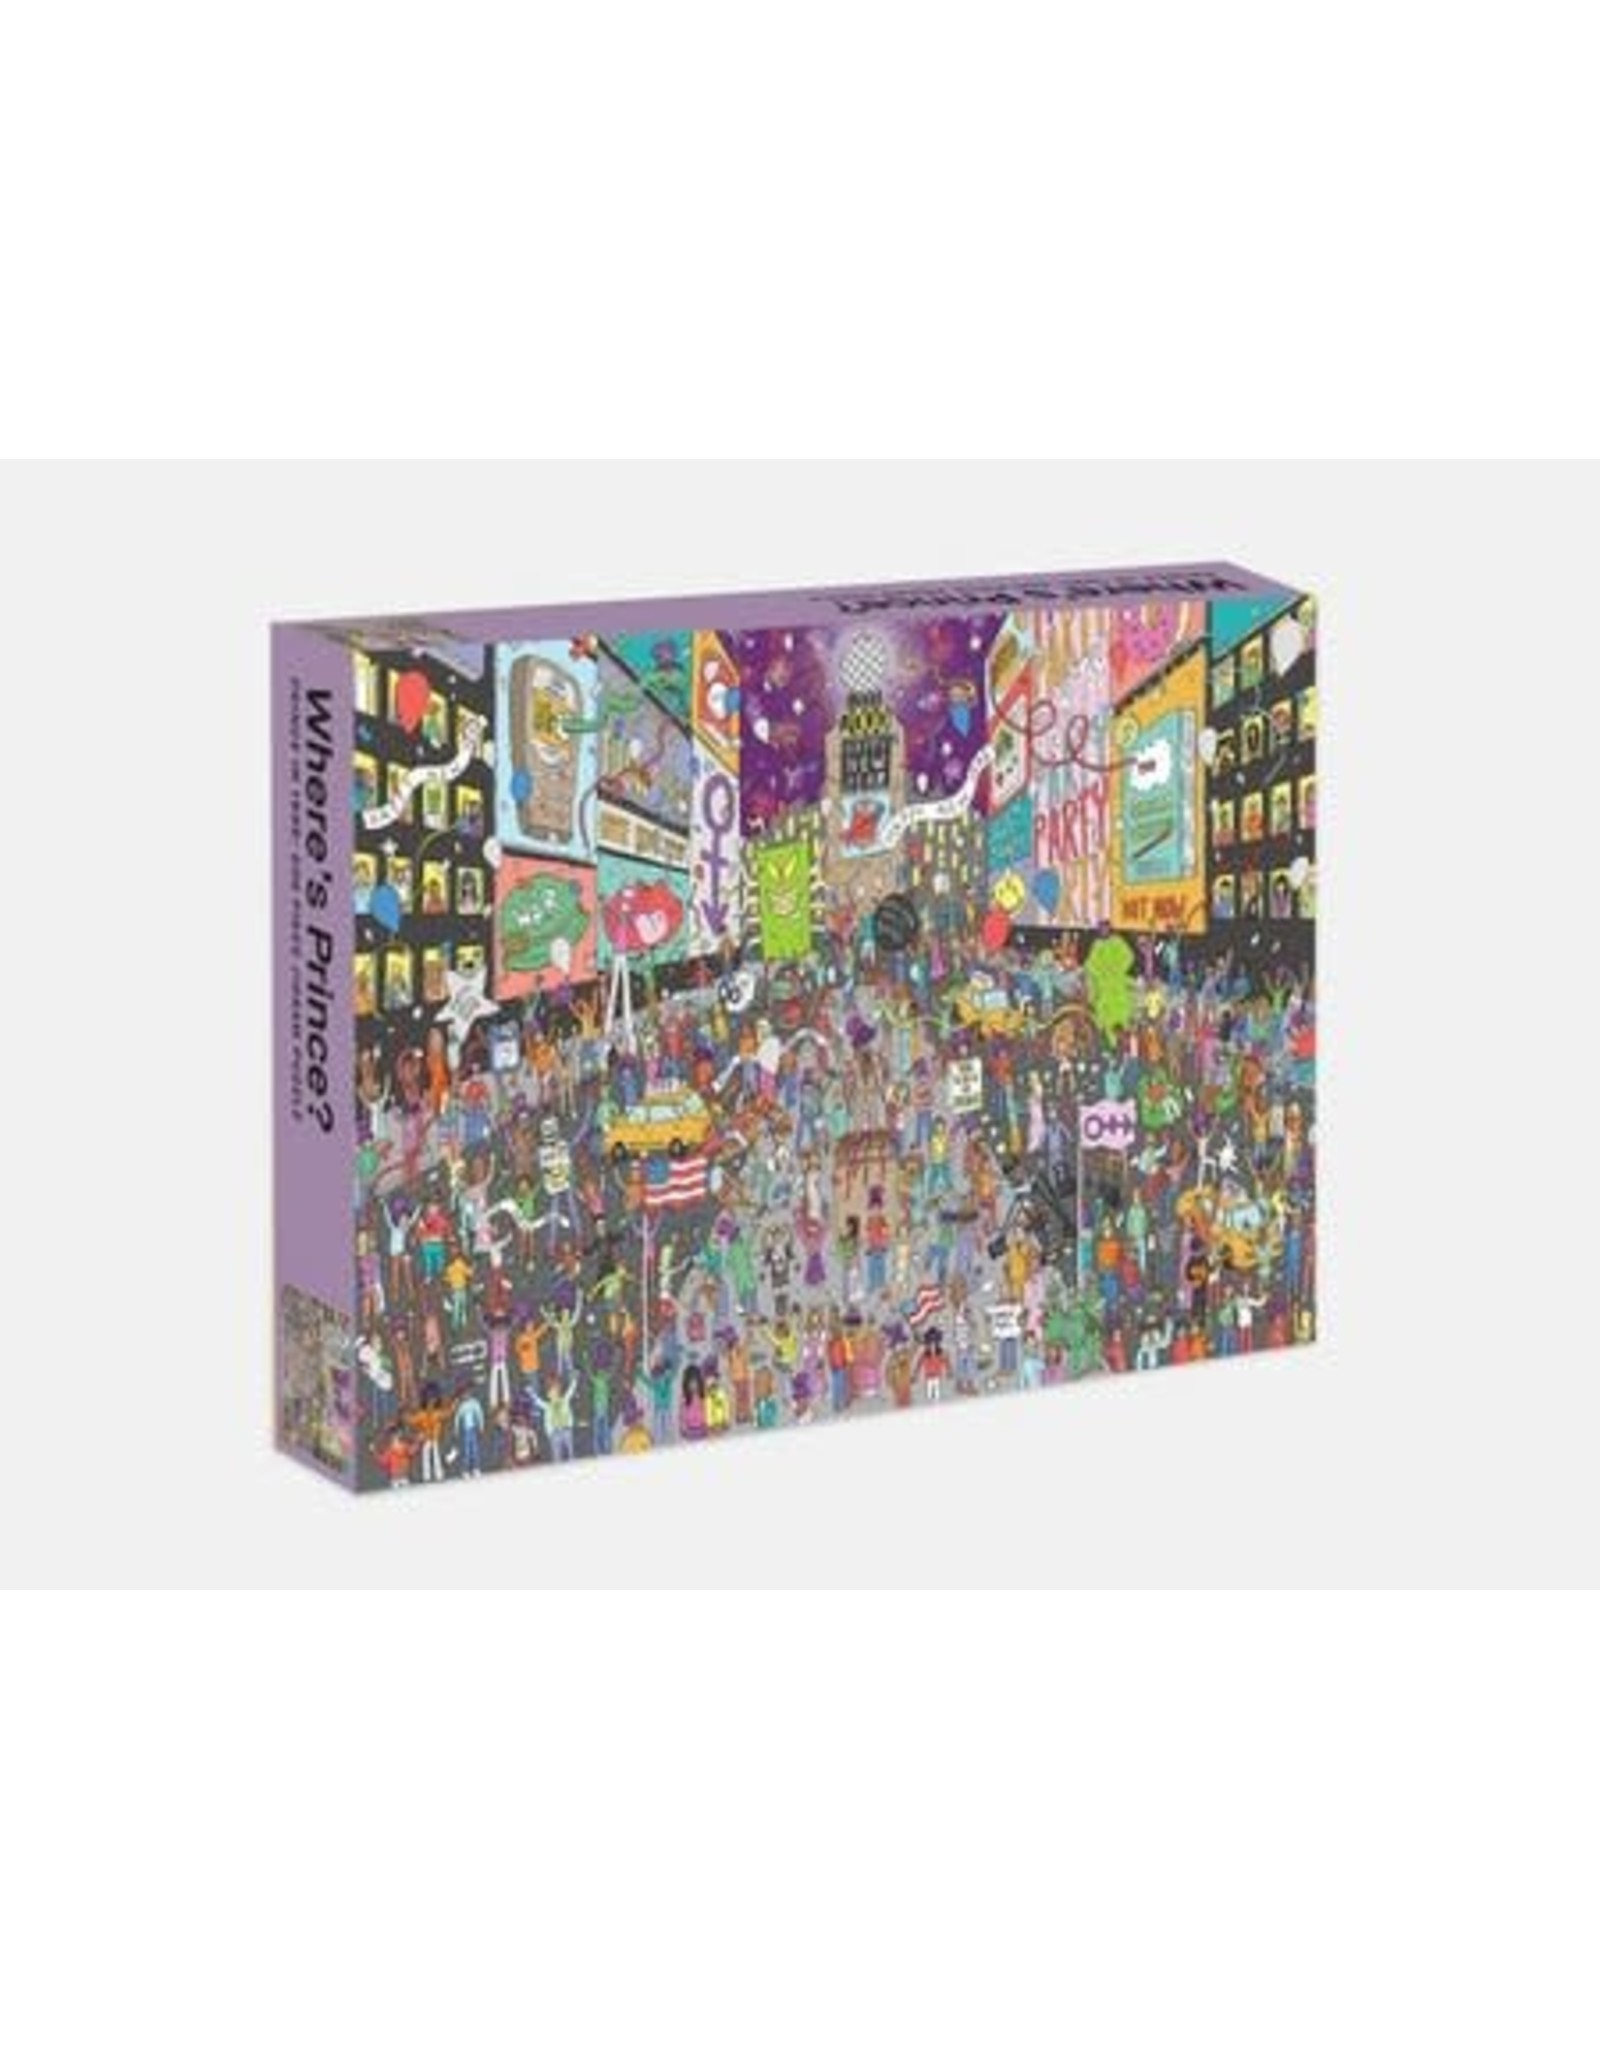 PRH - Puzzle Where's Prince? / 500 pcs